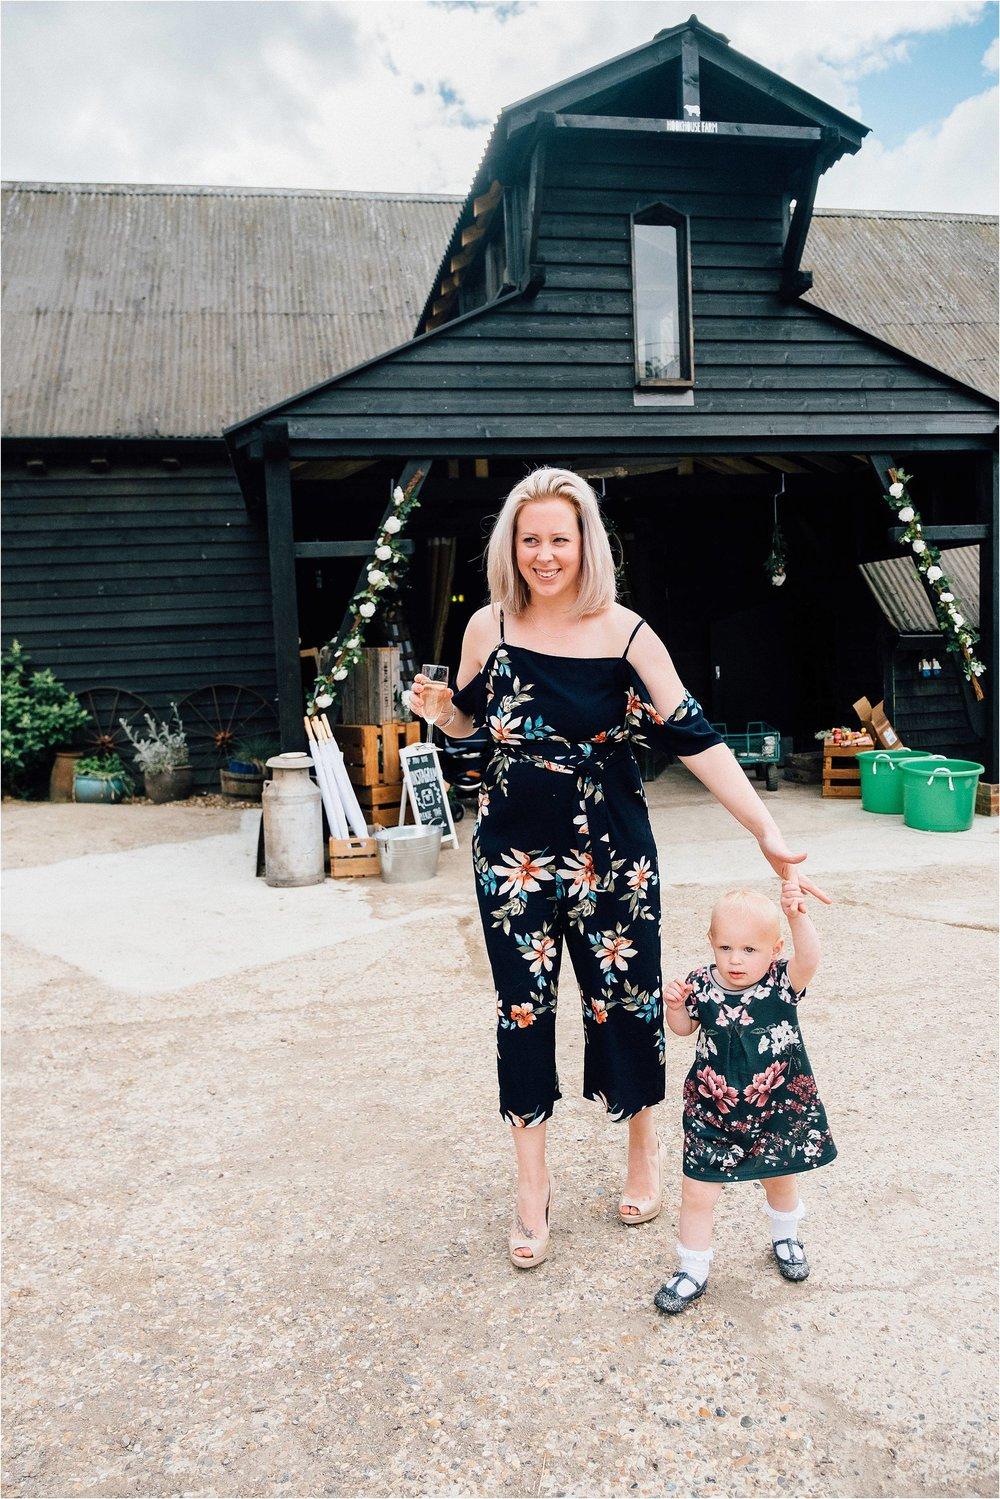 Surrey Hookhouse Farm Wedding Photographer_0137.jpg